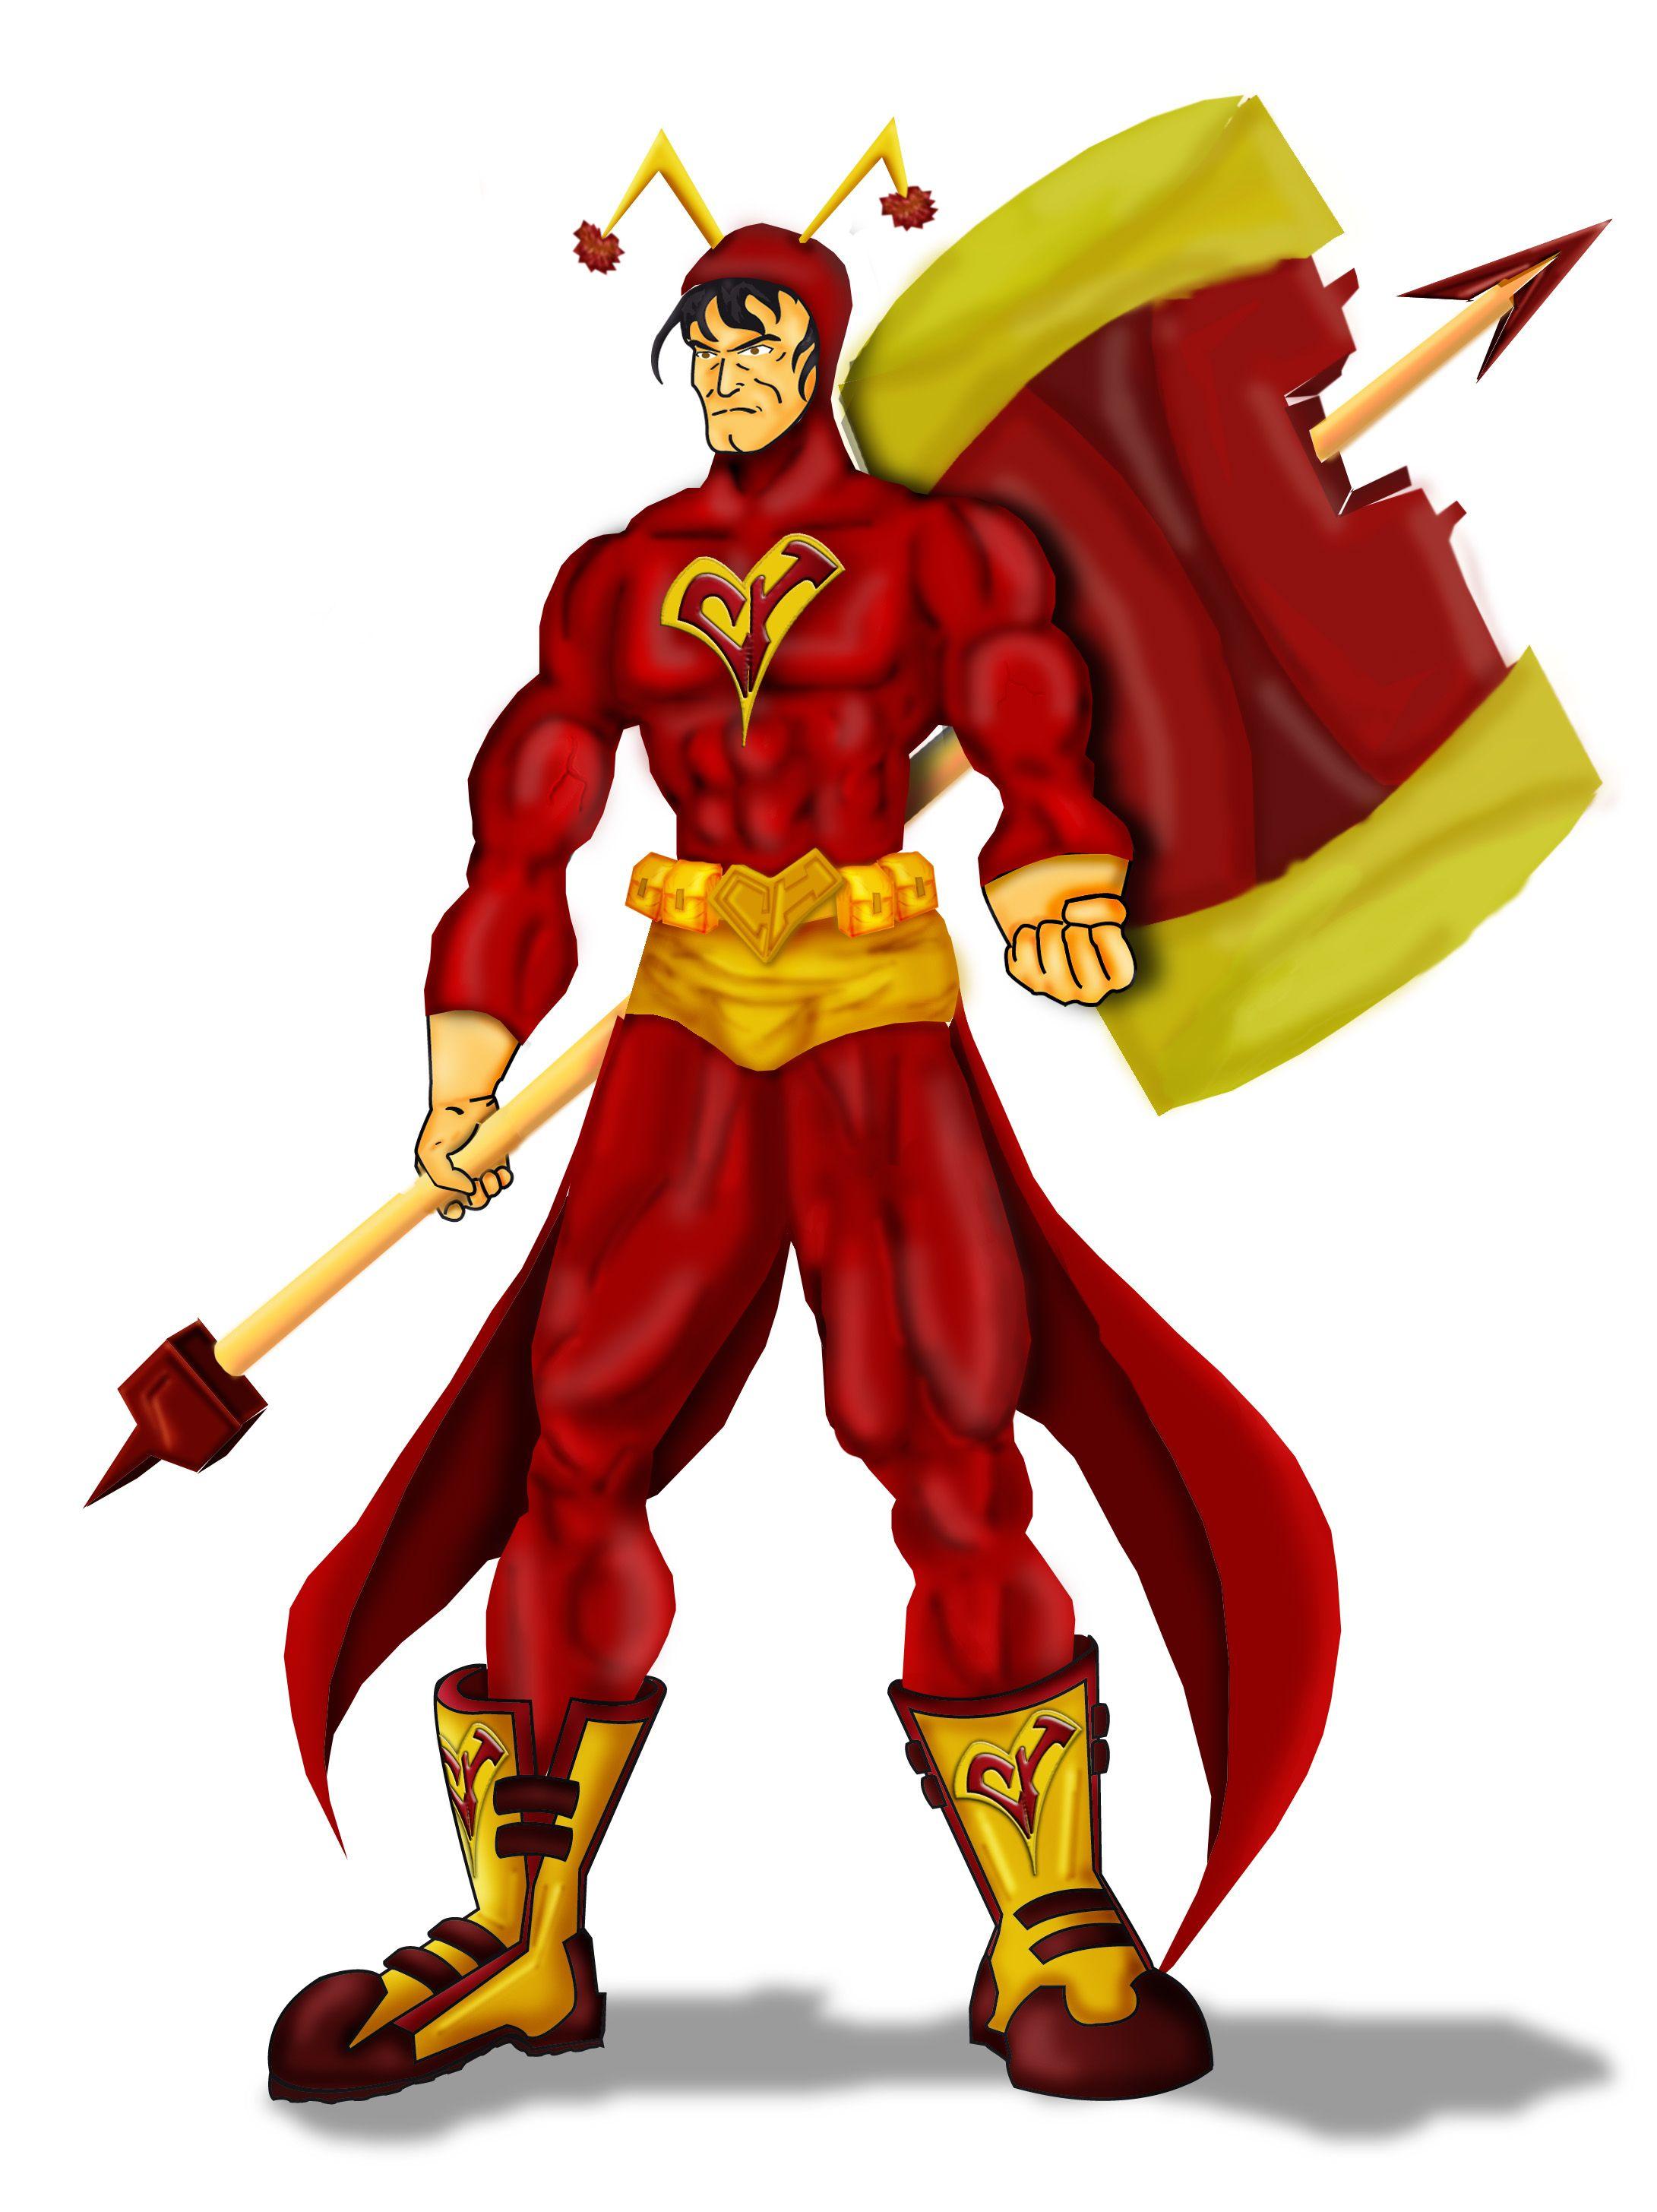 El Chapulin Colorado, fanart del personaje mexicano creado por Roberto  Gomez Bolaños #chespirito #chapulincolo…   Comic movies, Spiderman art,  Character design male